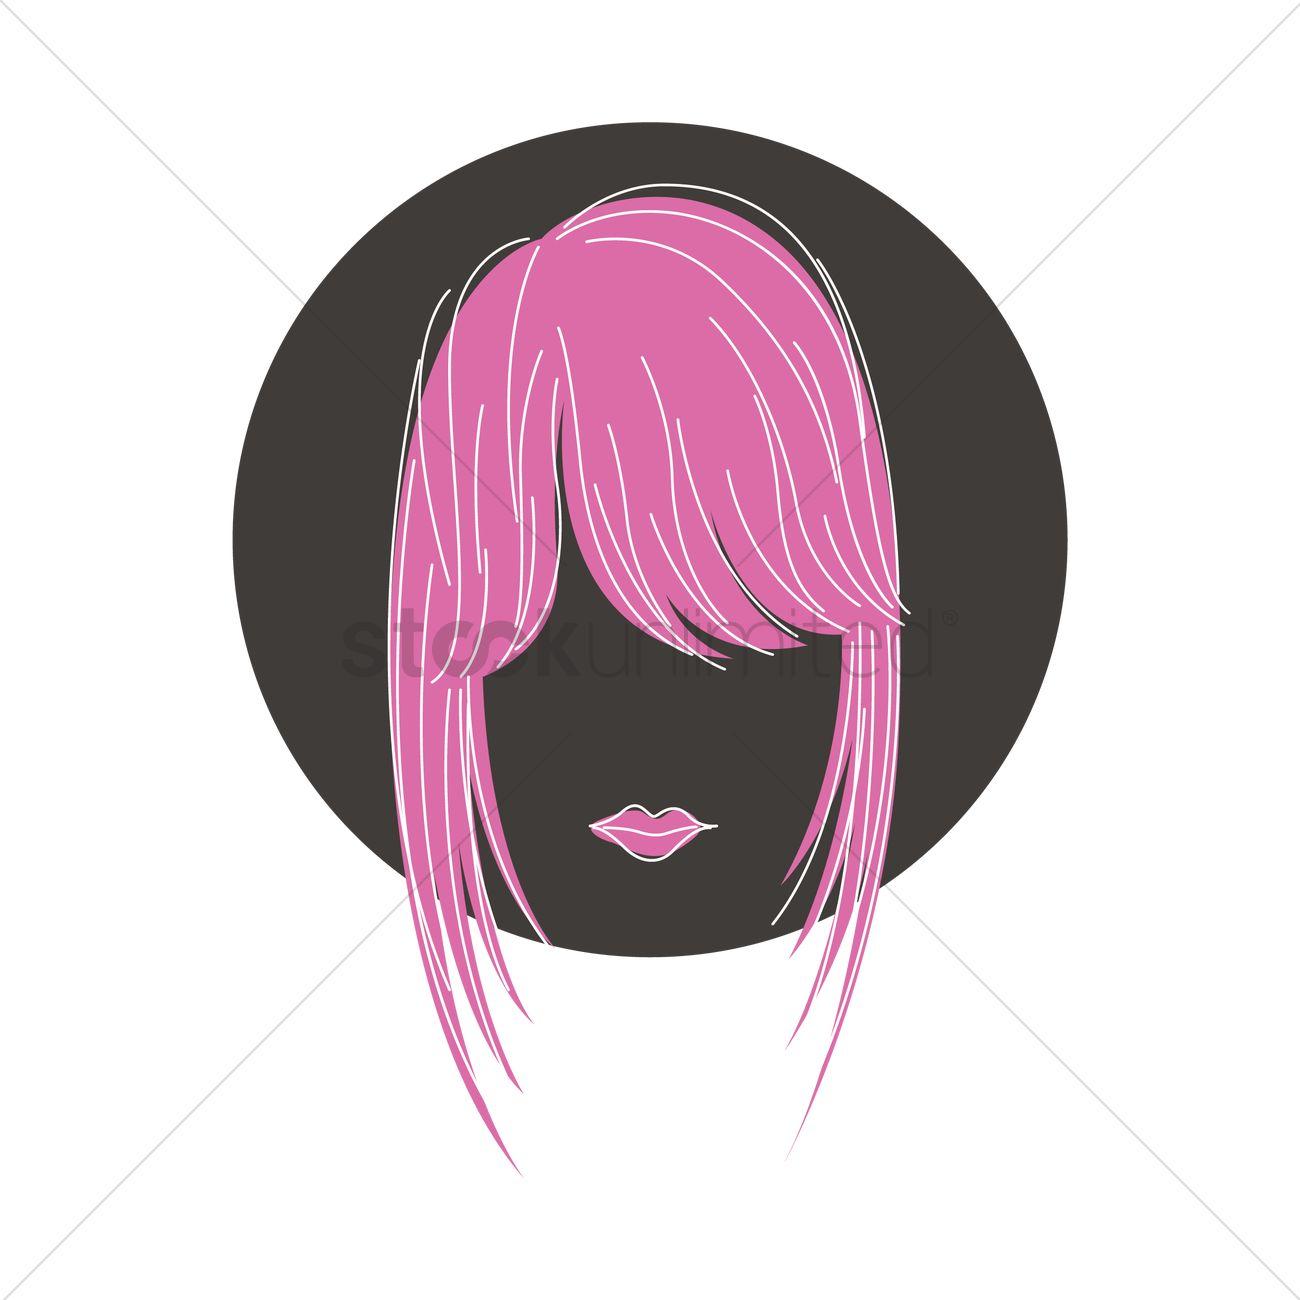 Fringe Hairstyle Vector Image 1373312 Stockunlimited